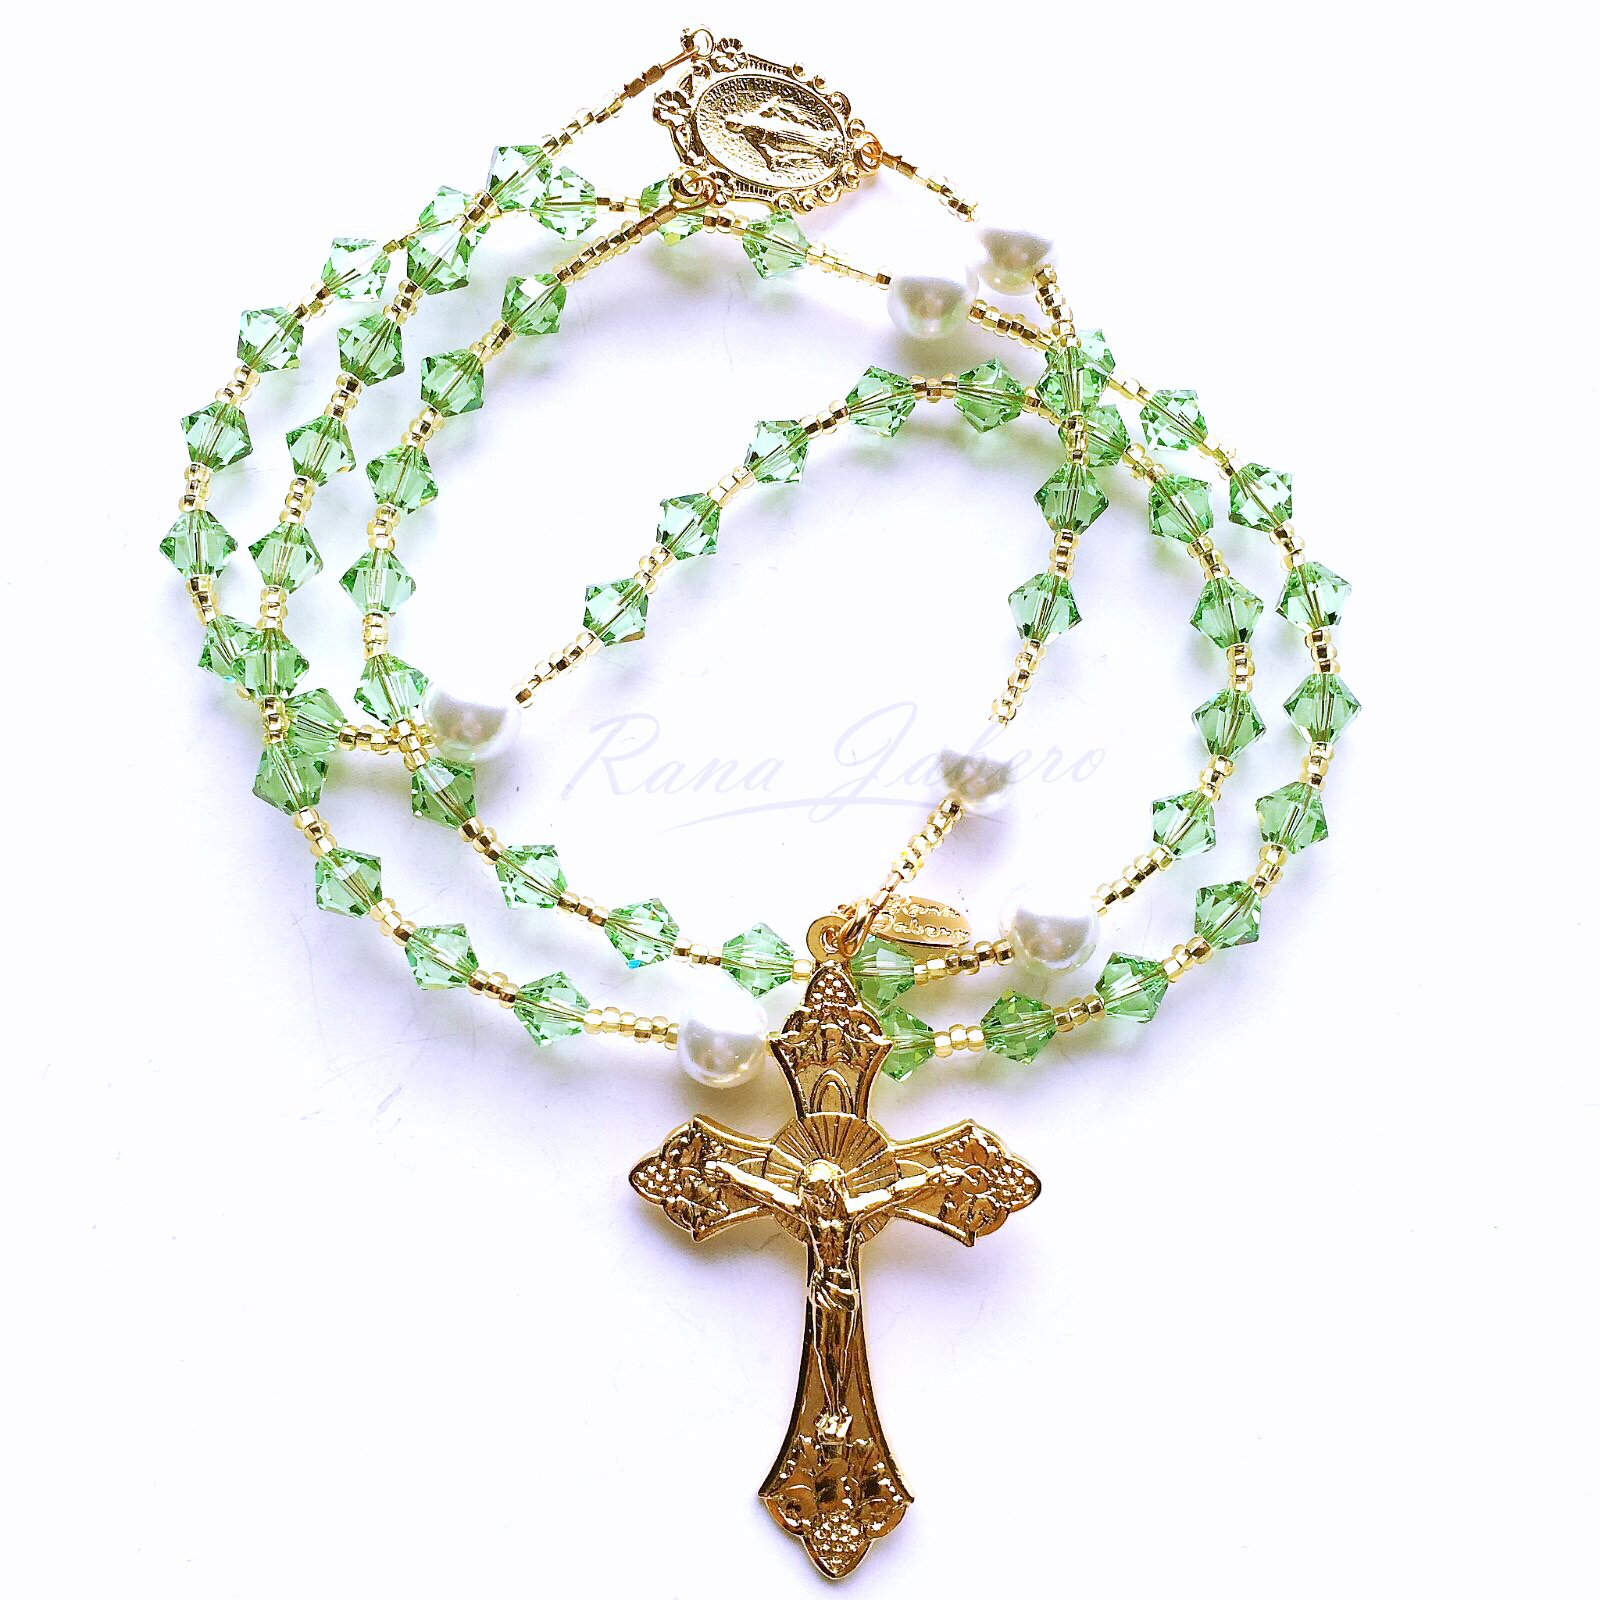 Rana Jabero Gold Peridot (August Birthstone) Swarovski Crystal and Glass Pearl Rosary